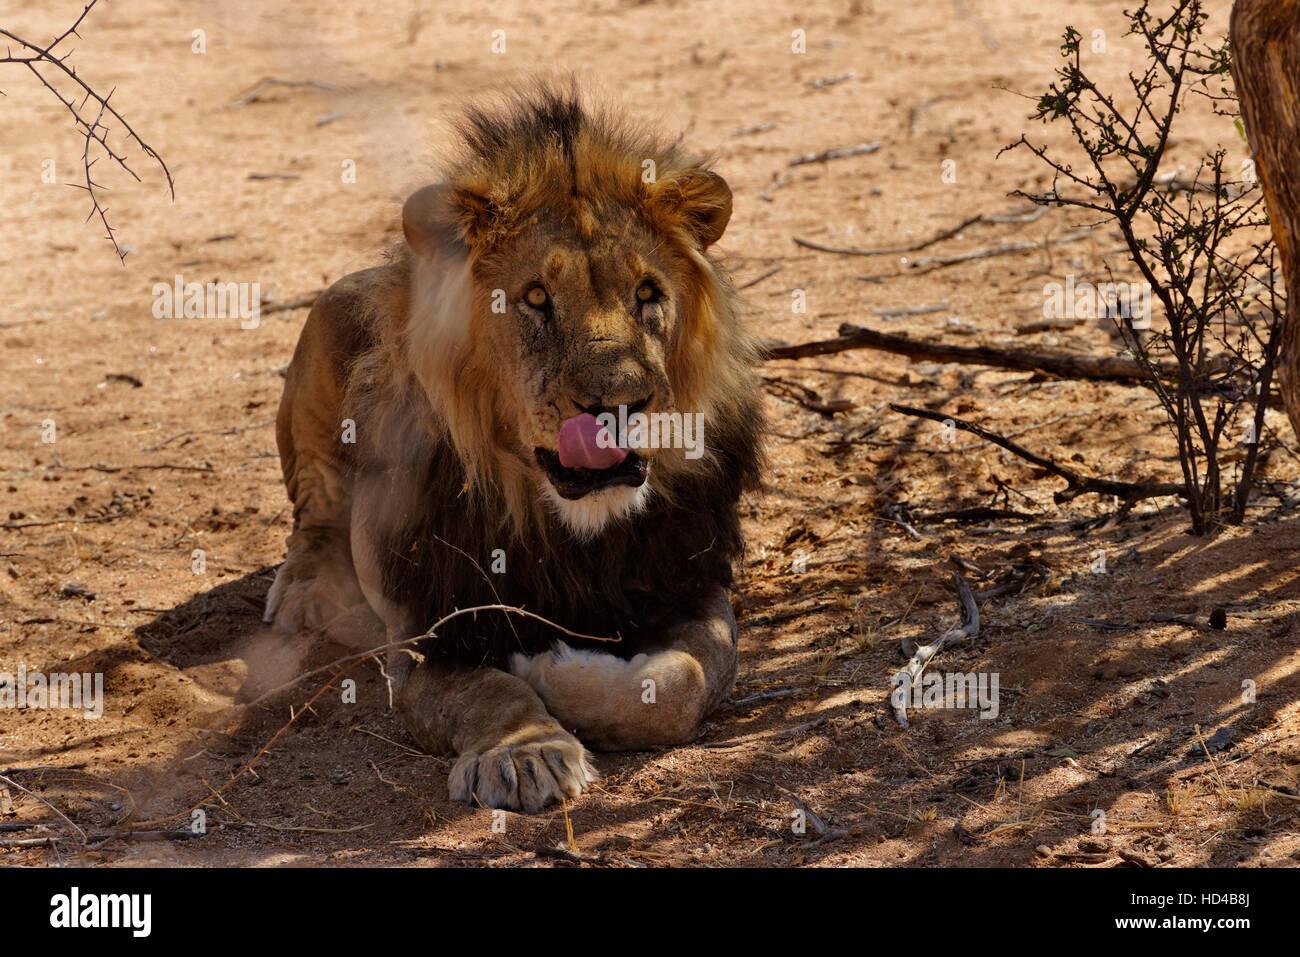 Male lion (Panthera leo) in Erindi Private Game Reserve near Omaruru, Erongo Region, Namibia Stock Photo